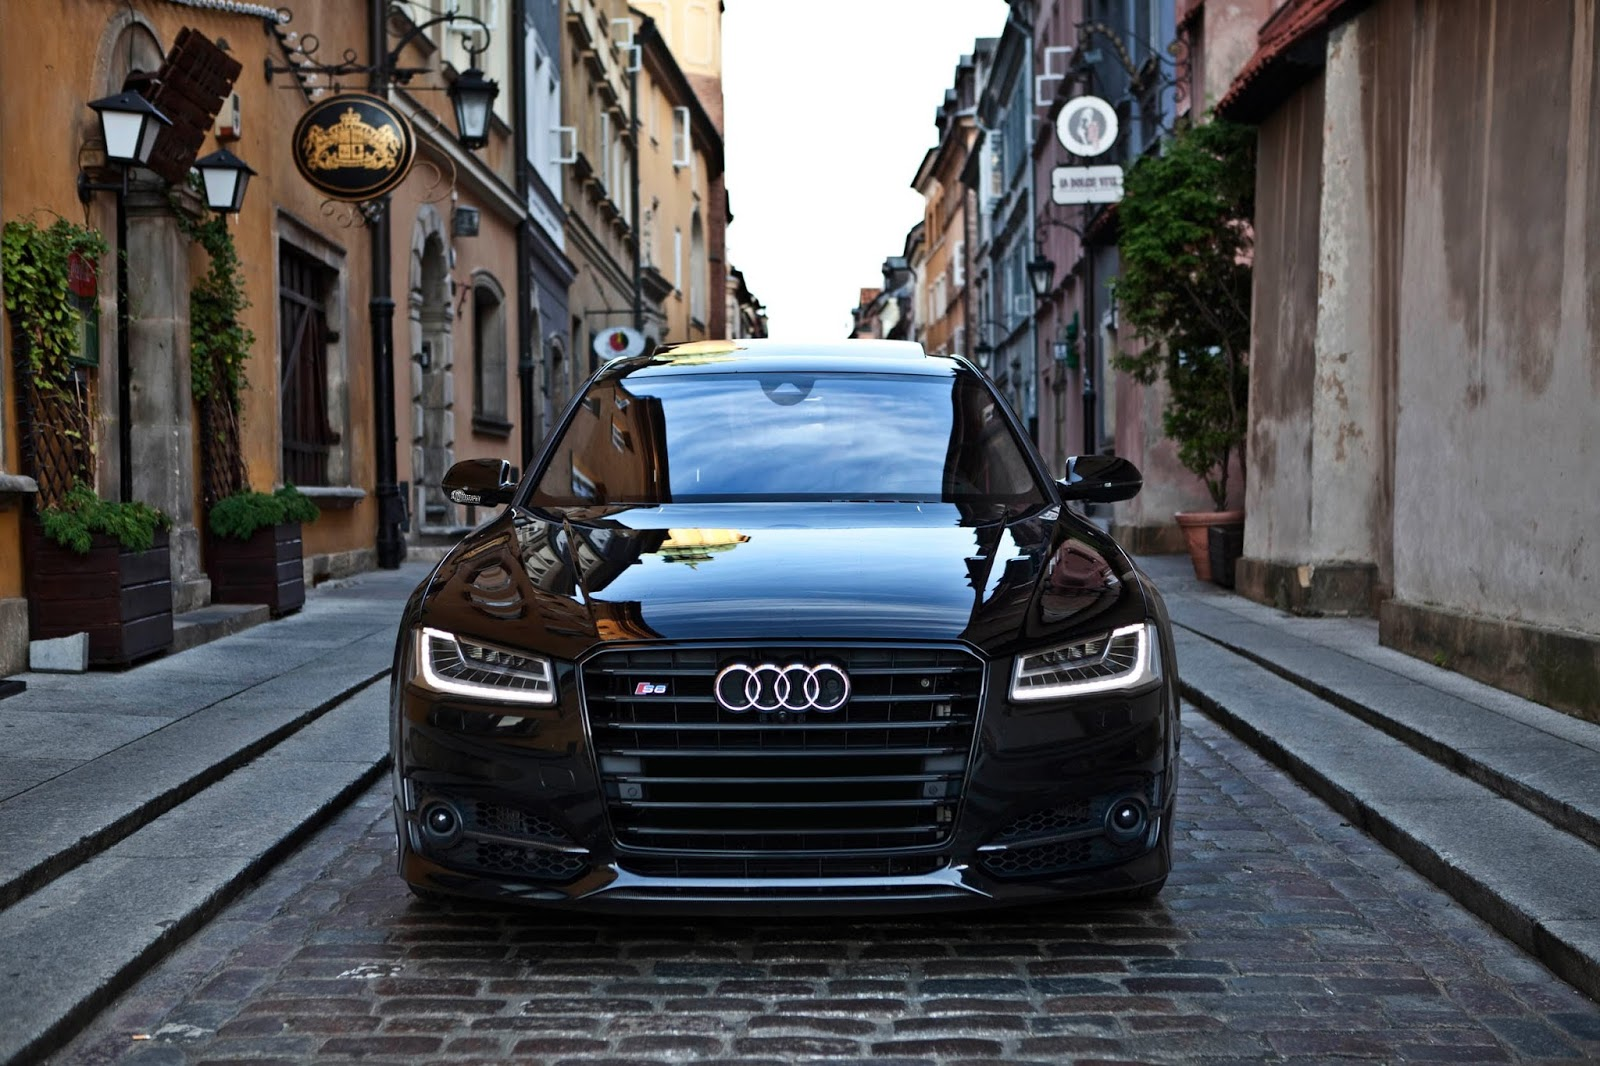 cars review concept specs price. Black Bedroom Furniture Sets. Home Design Ideas